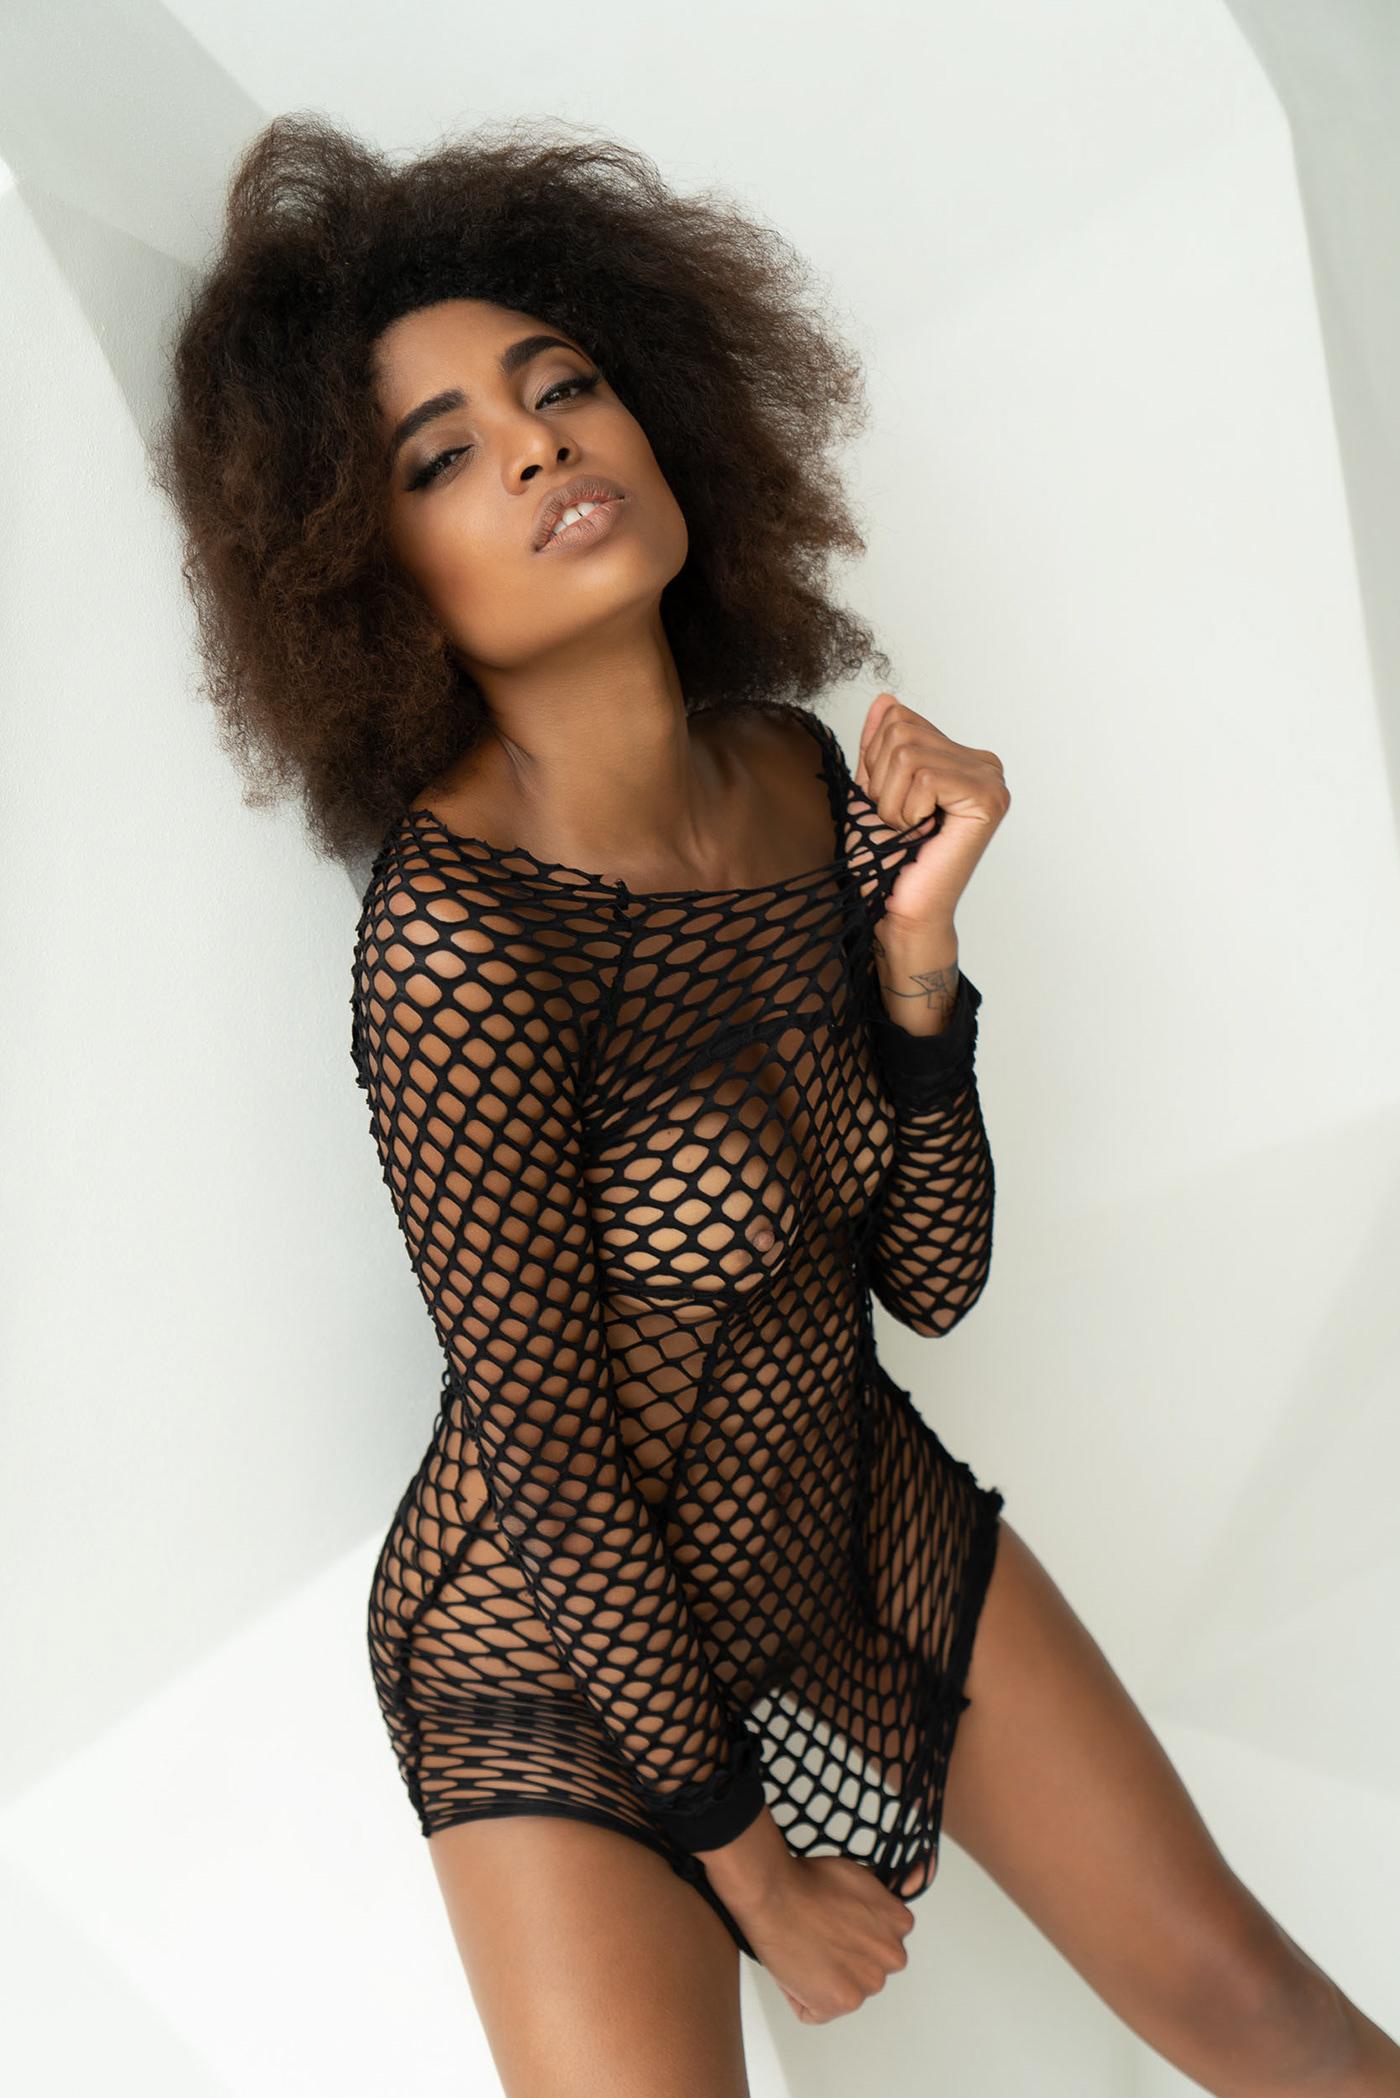 Девушка месяца Playboy CZ 2018 Aug Playmate Luna Corazon